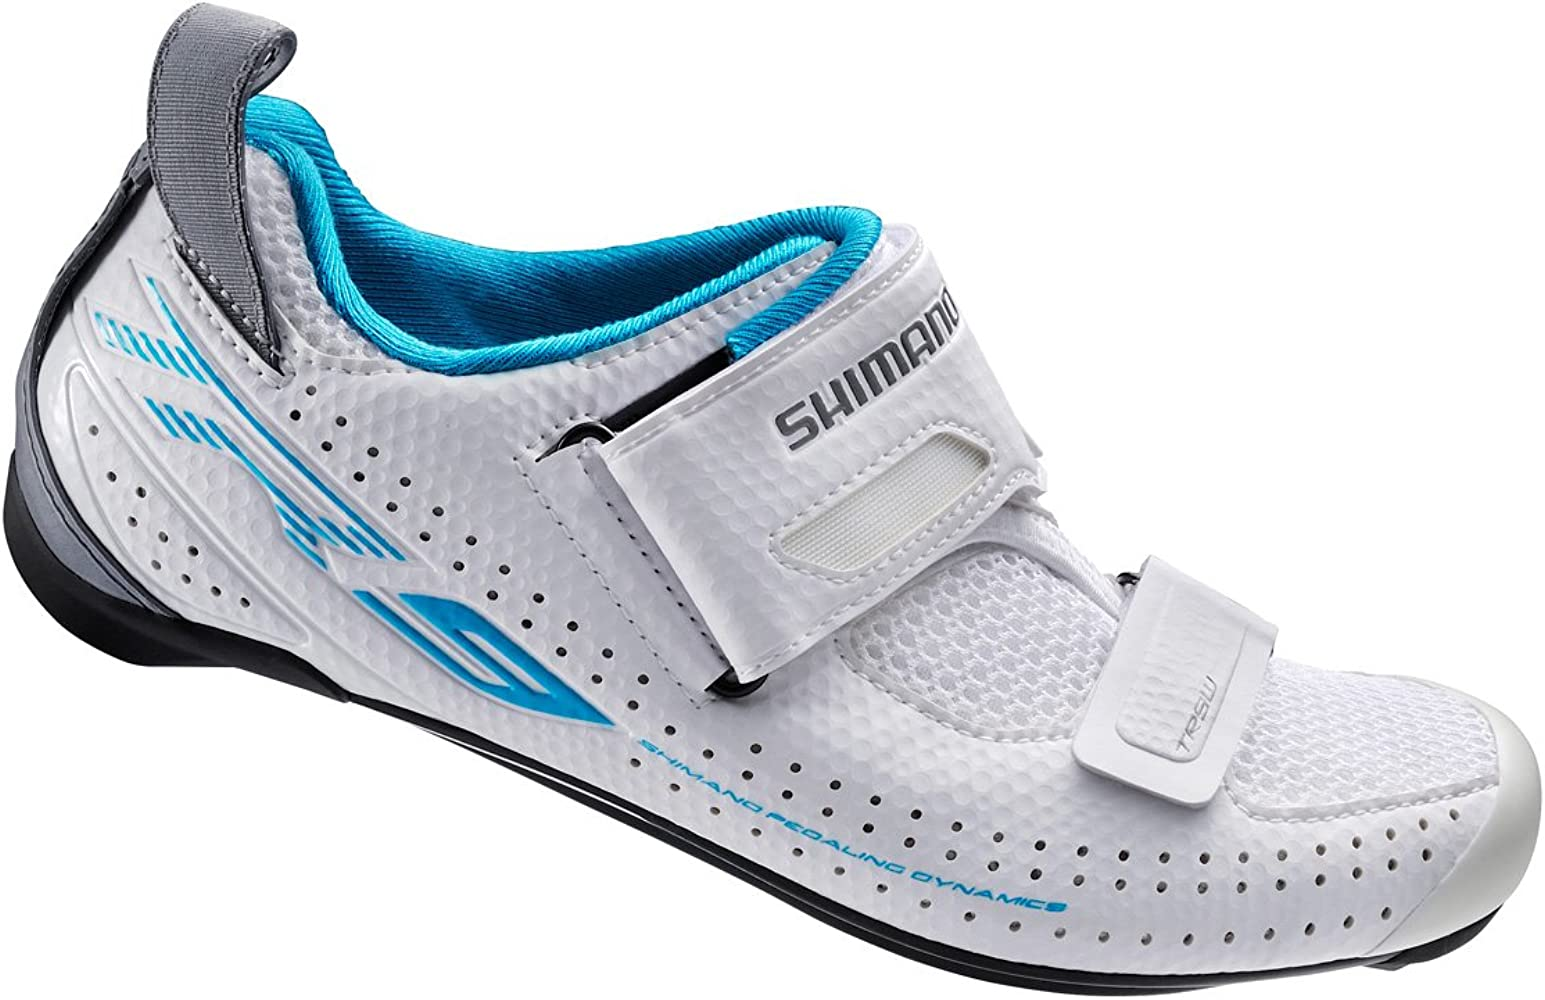 Shimano SH-TR9-B Triathlon Elite Carbon Cycling Road Bike Racing Shoes Men Blue